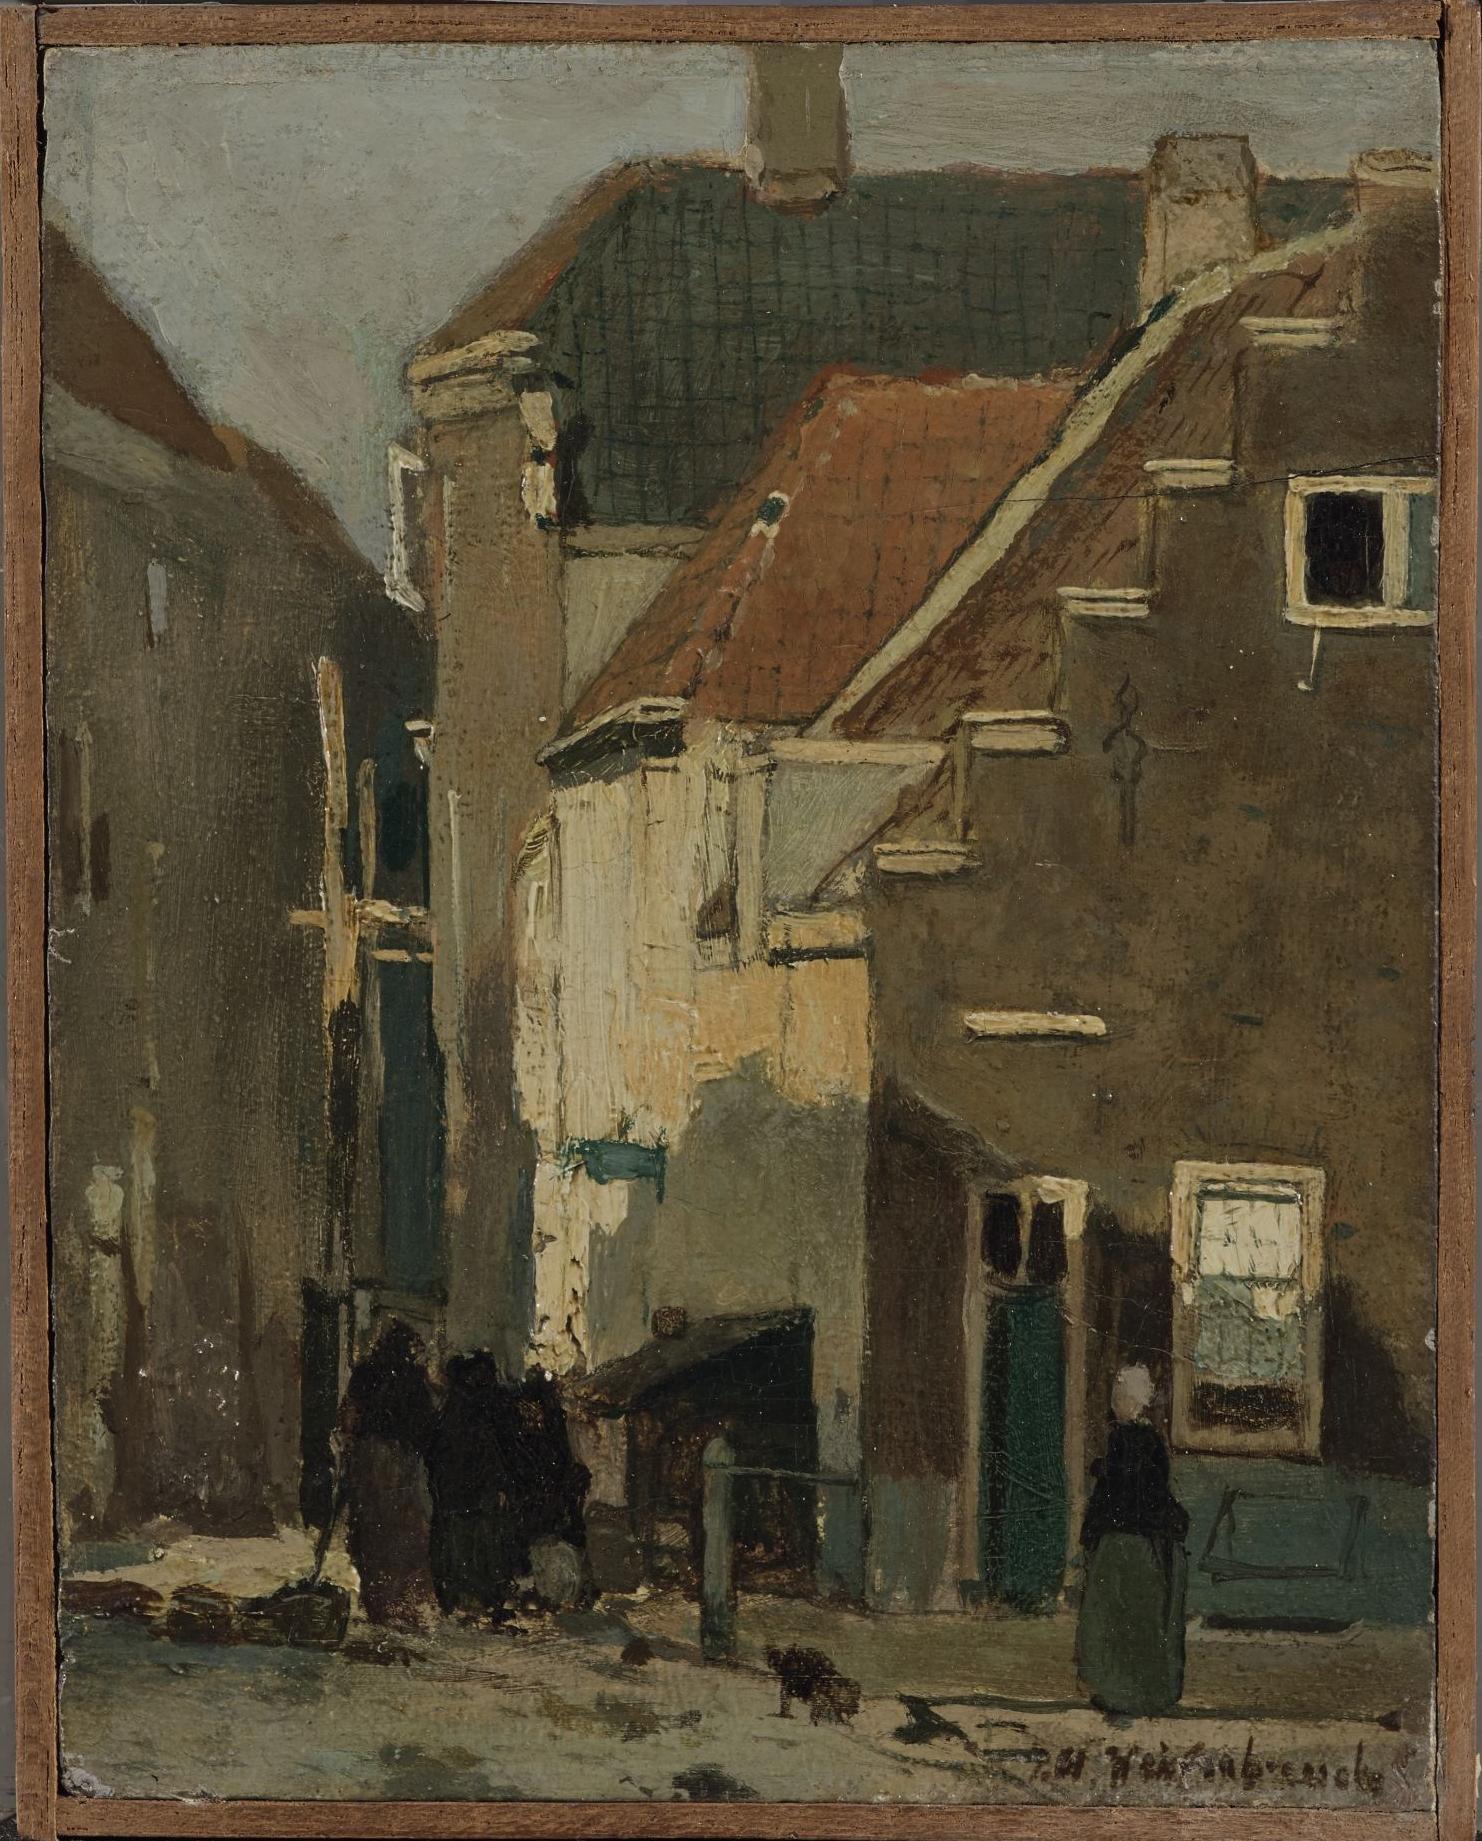 Kazernestraat in Den Haag  voor restauratie in daglicht